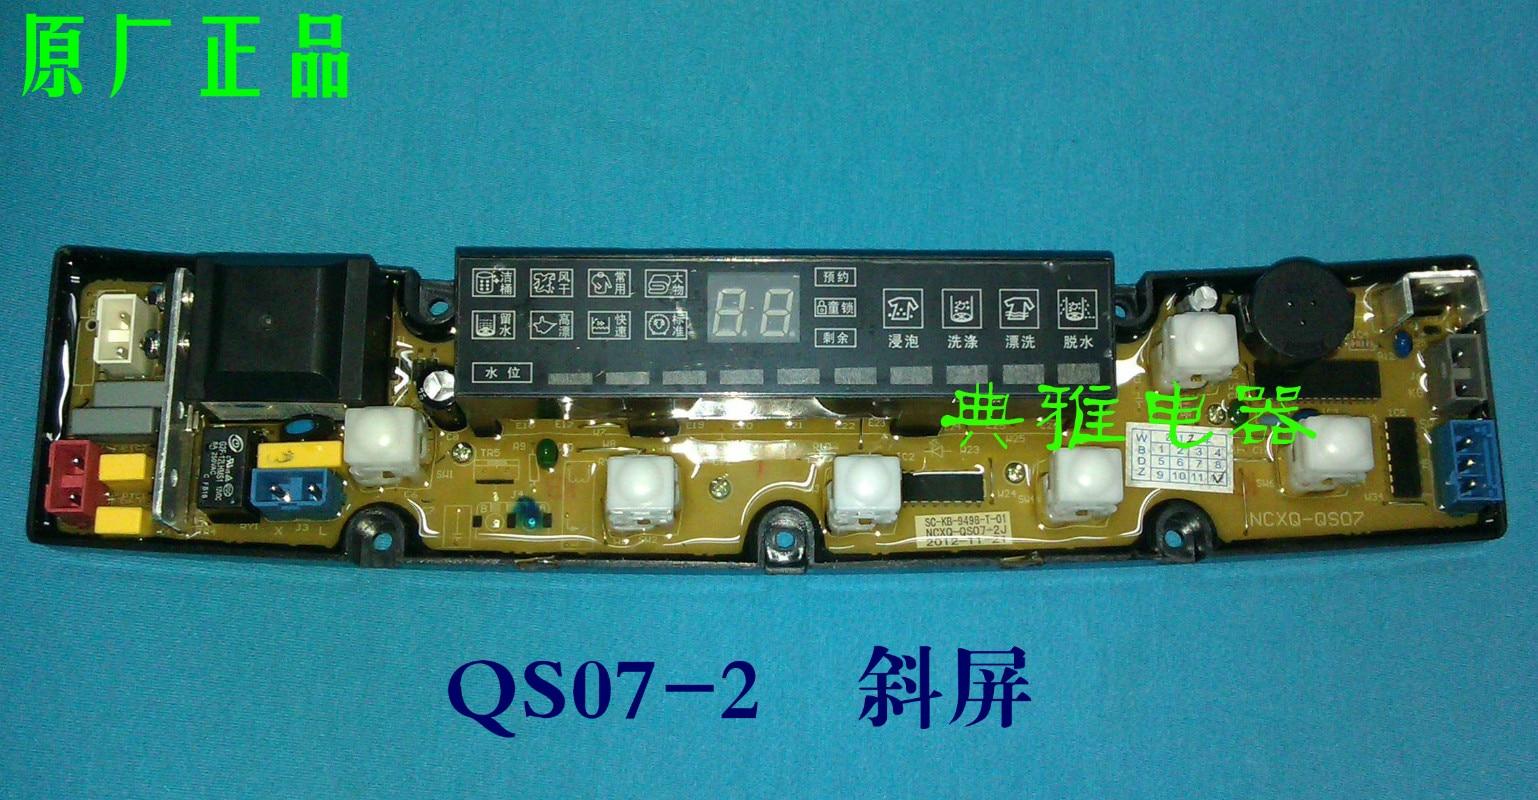 Washing machine board xqb72-78 original motherboard ncxq-qs07-2 qs07-2 screen washing machine board xqb60 318a control board js318b x circuit board motherboard